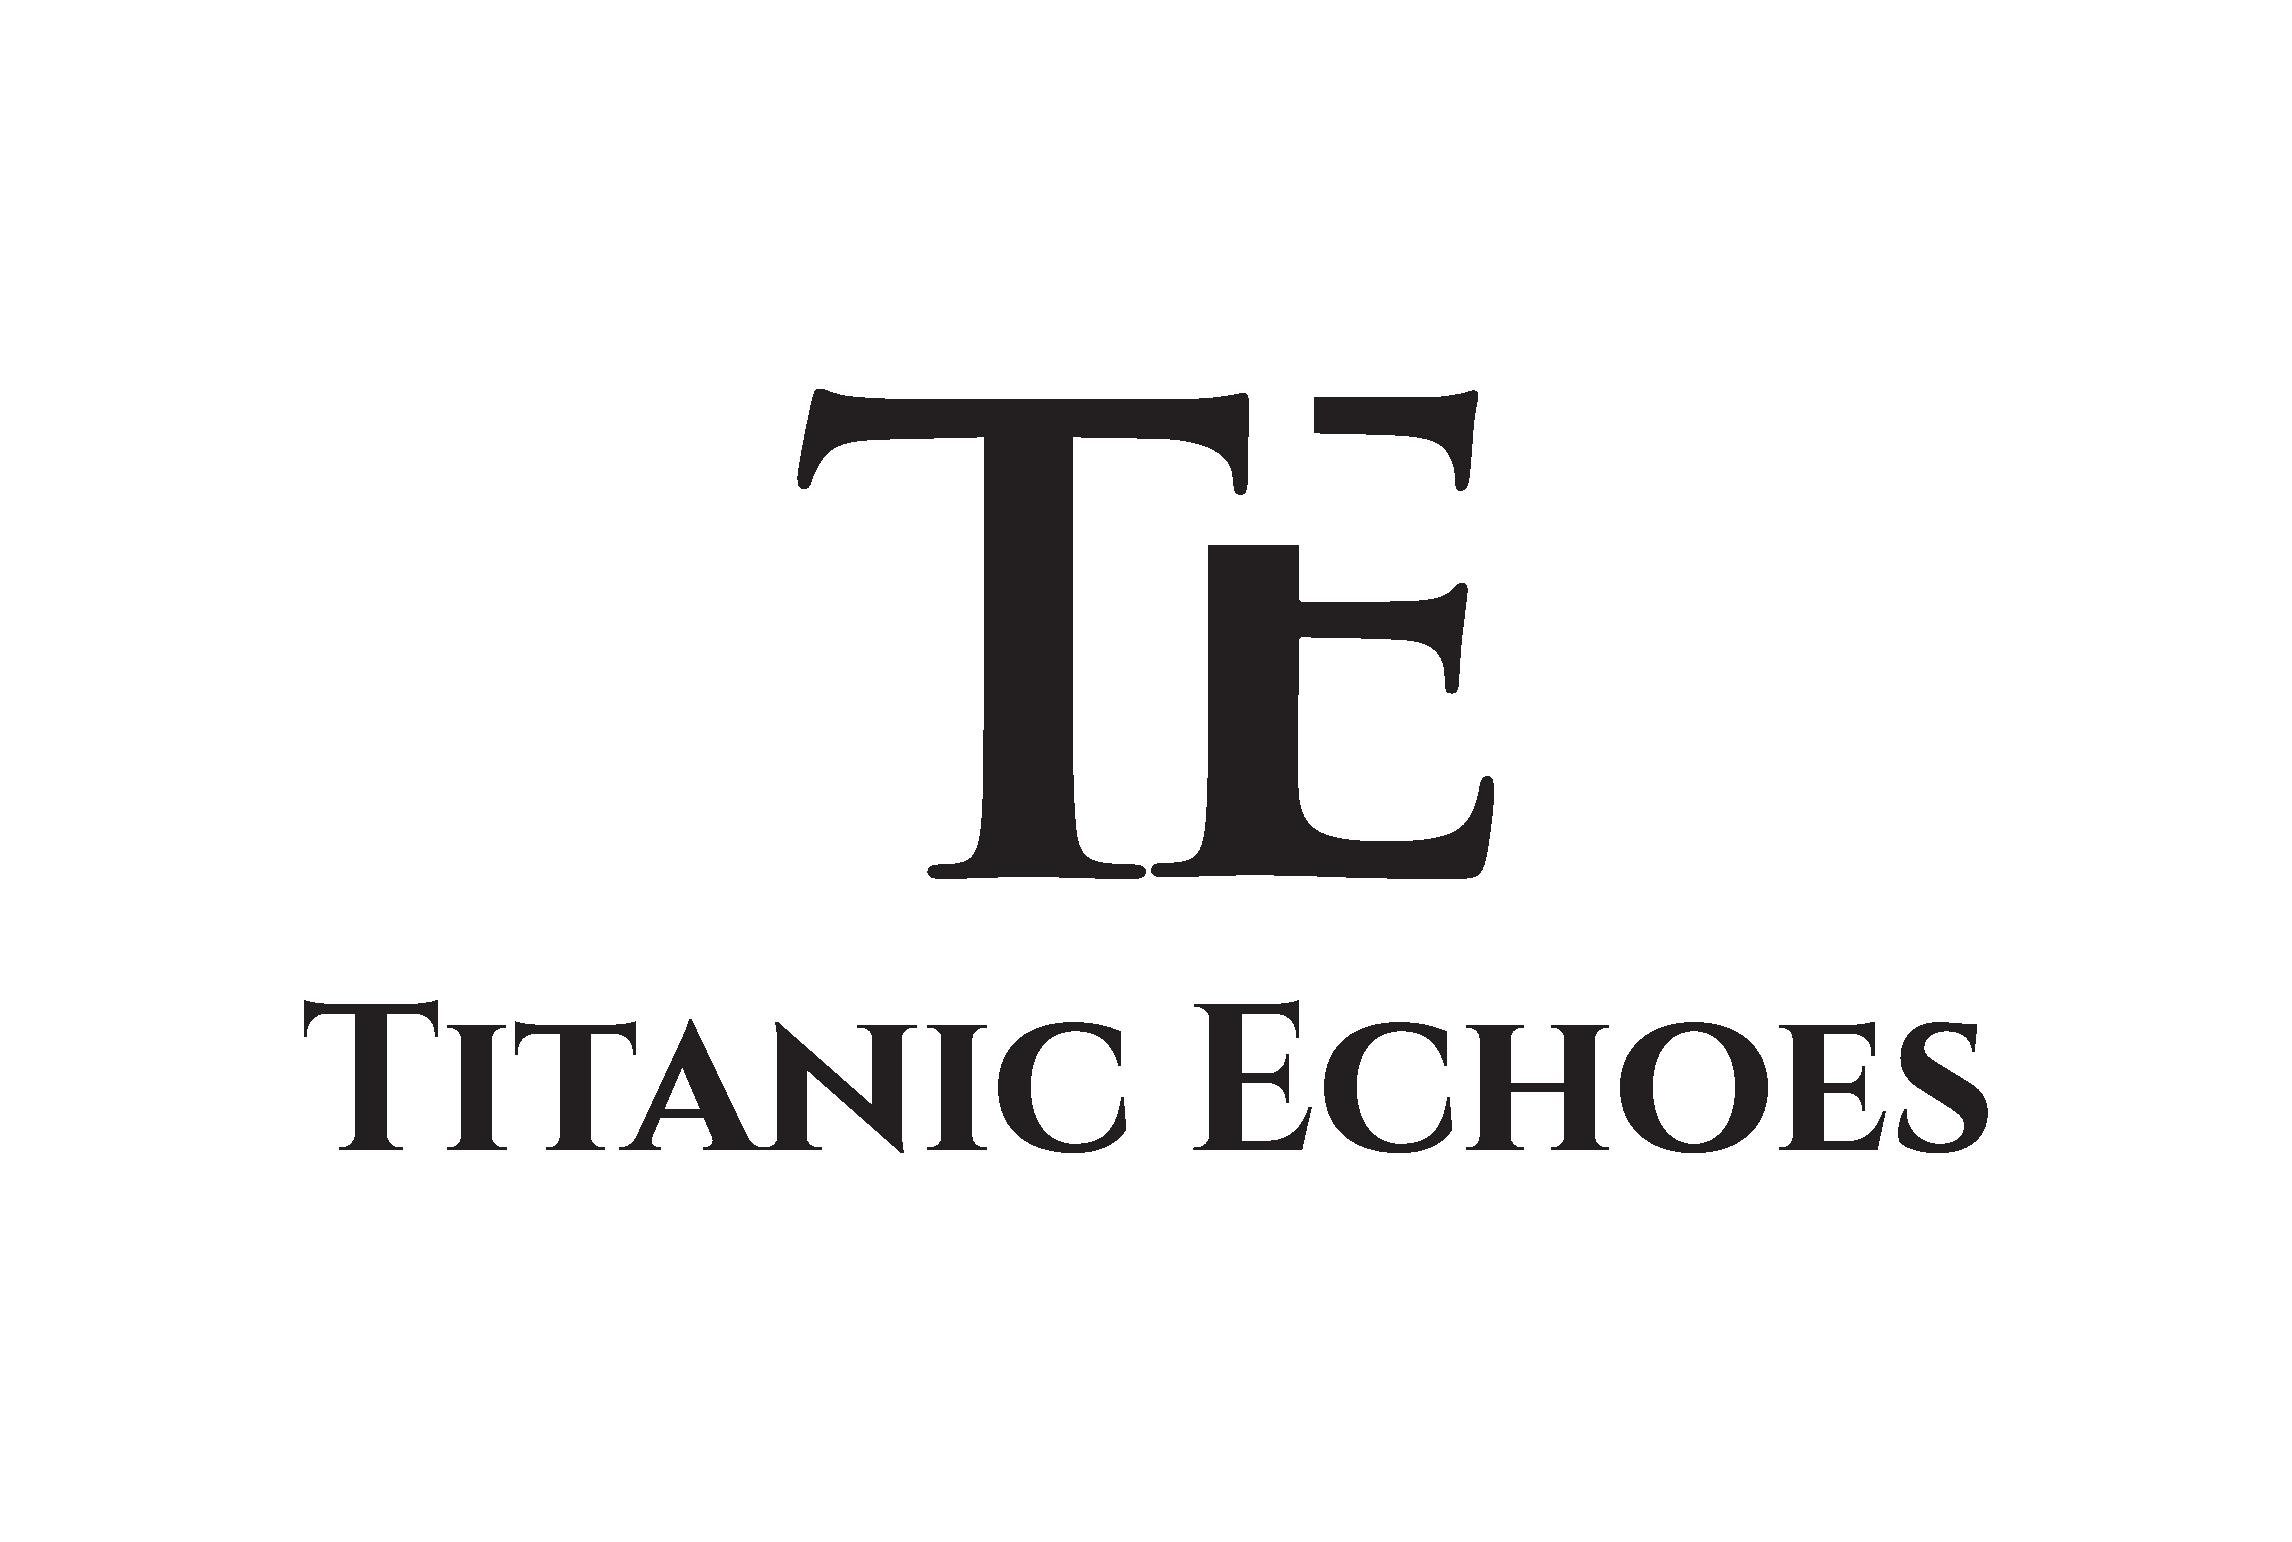 Titanic Echoes-04